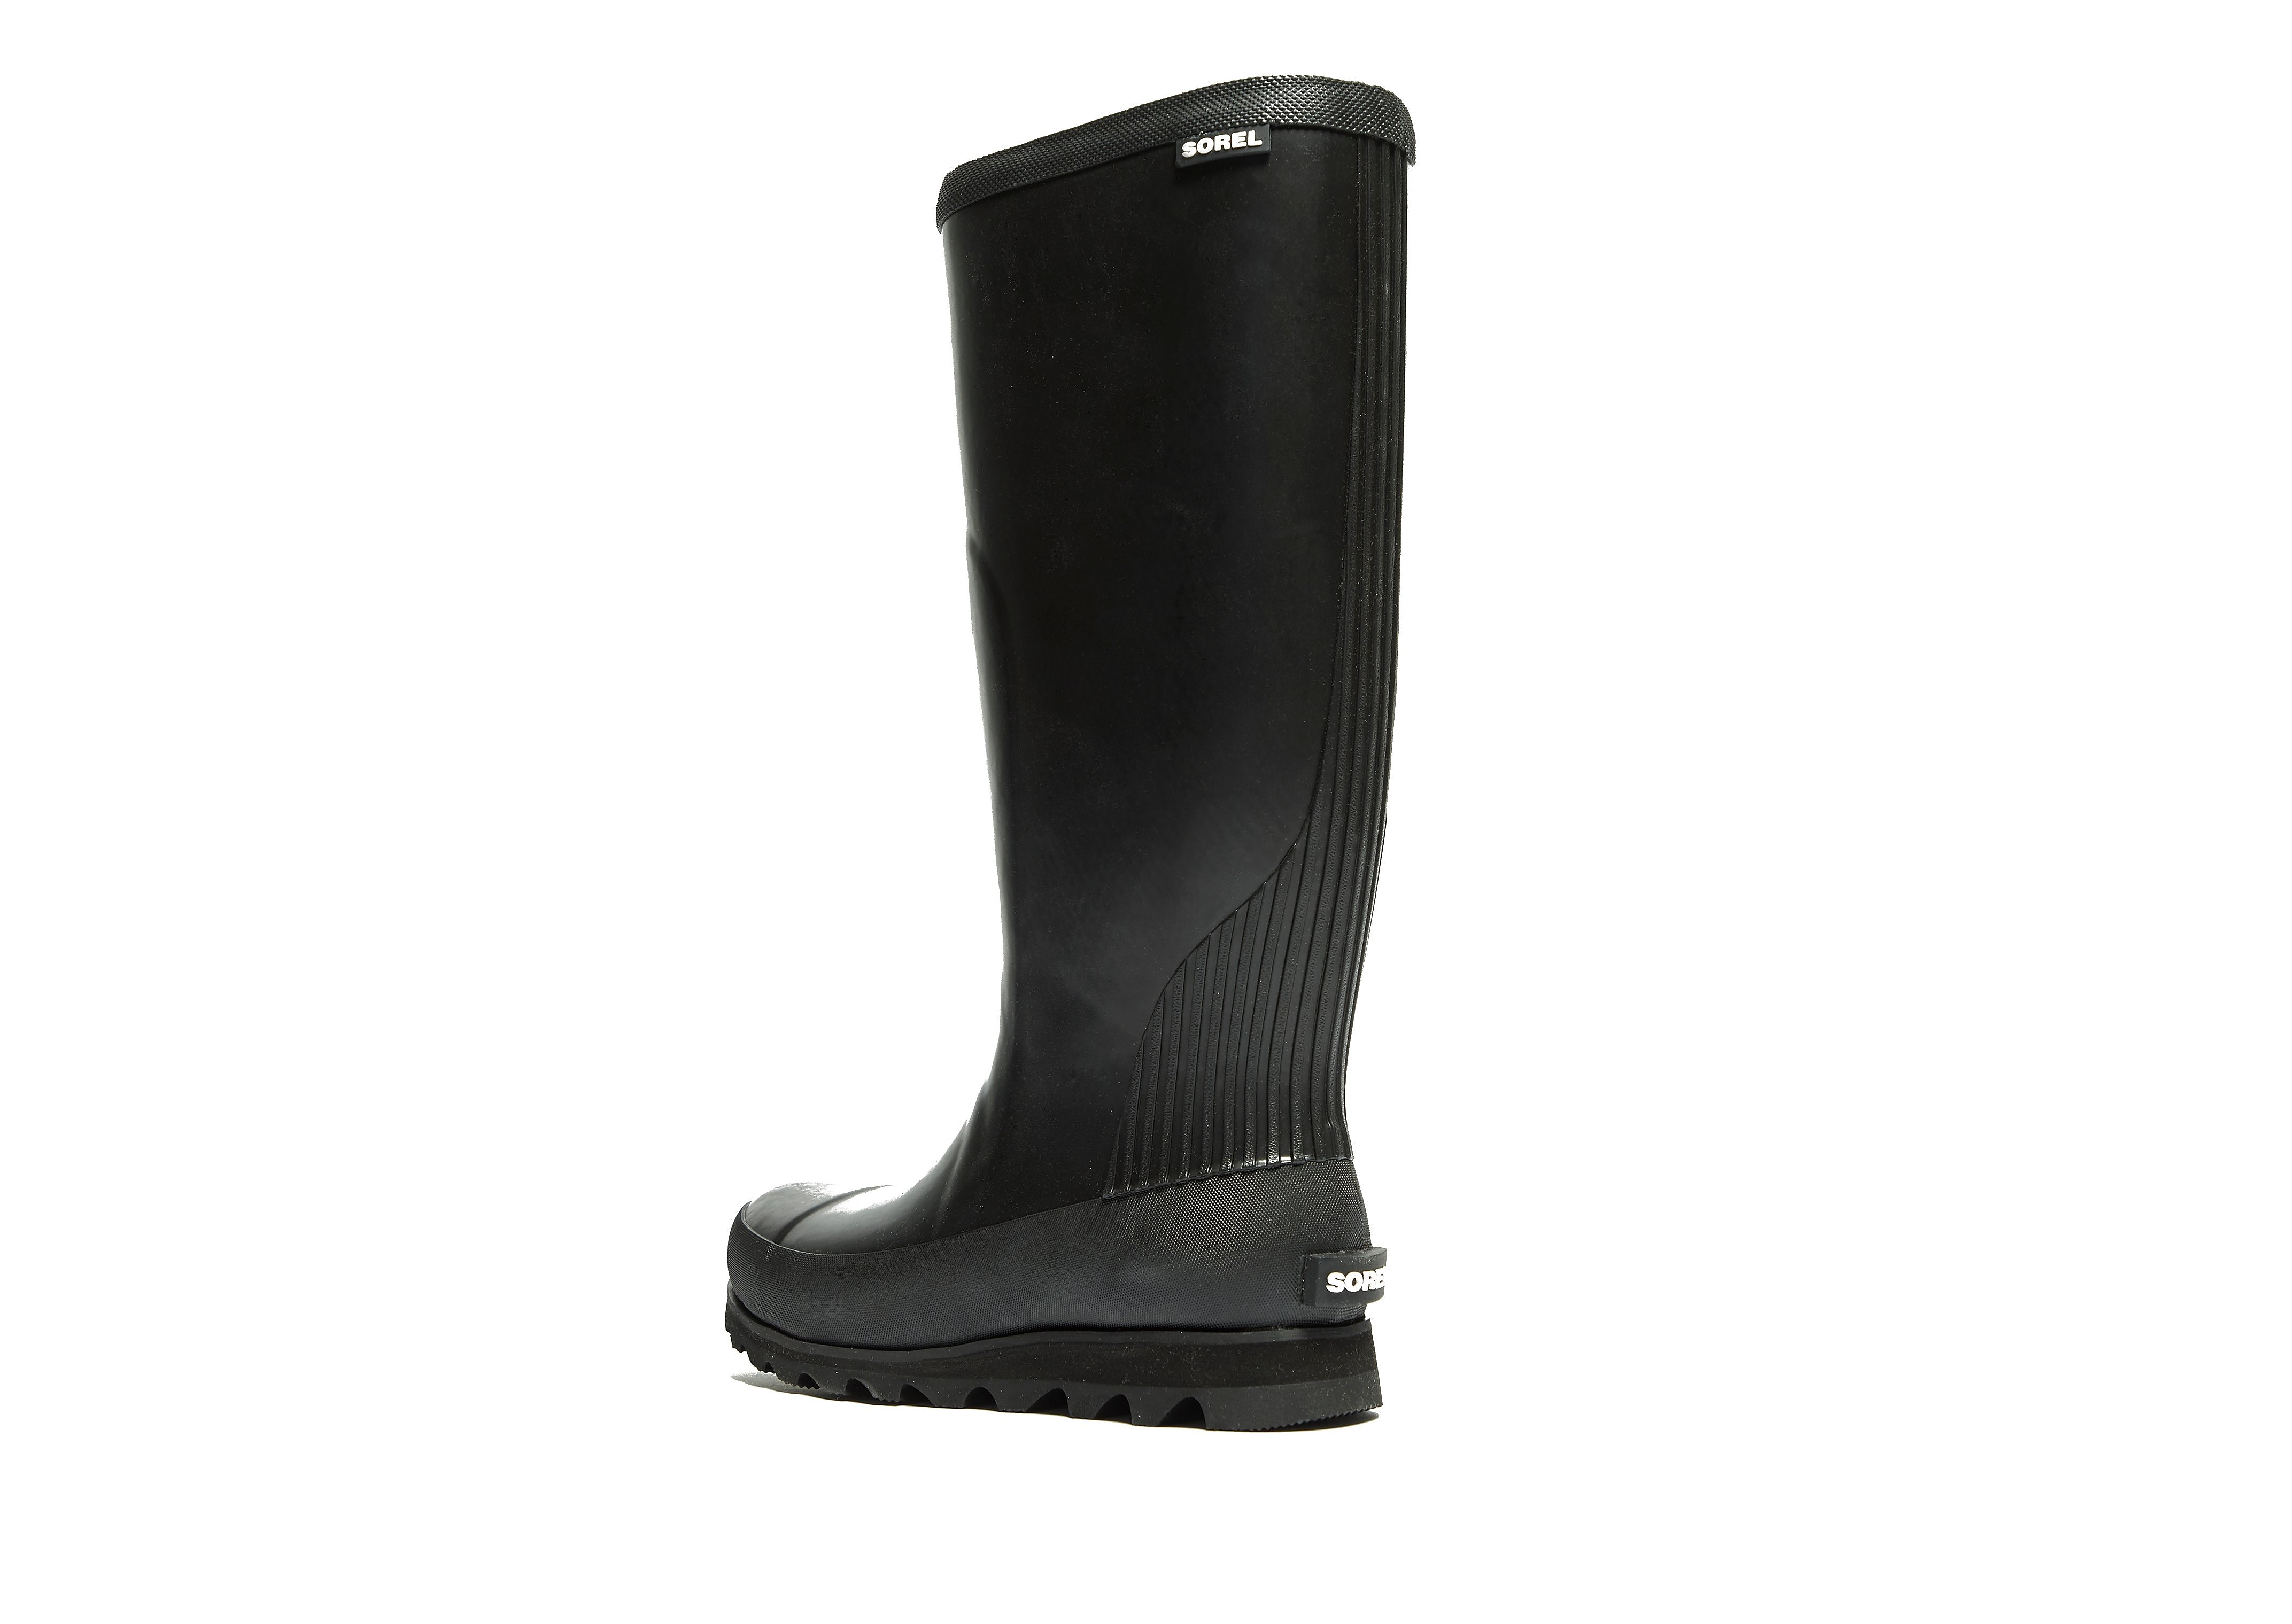 Sorel Women's Joan Rain Wedge Tall Boots